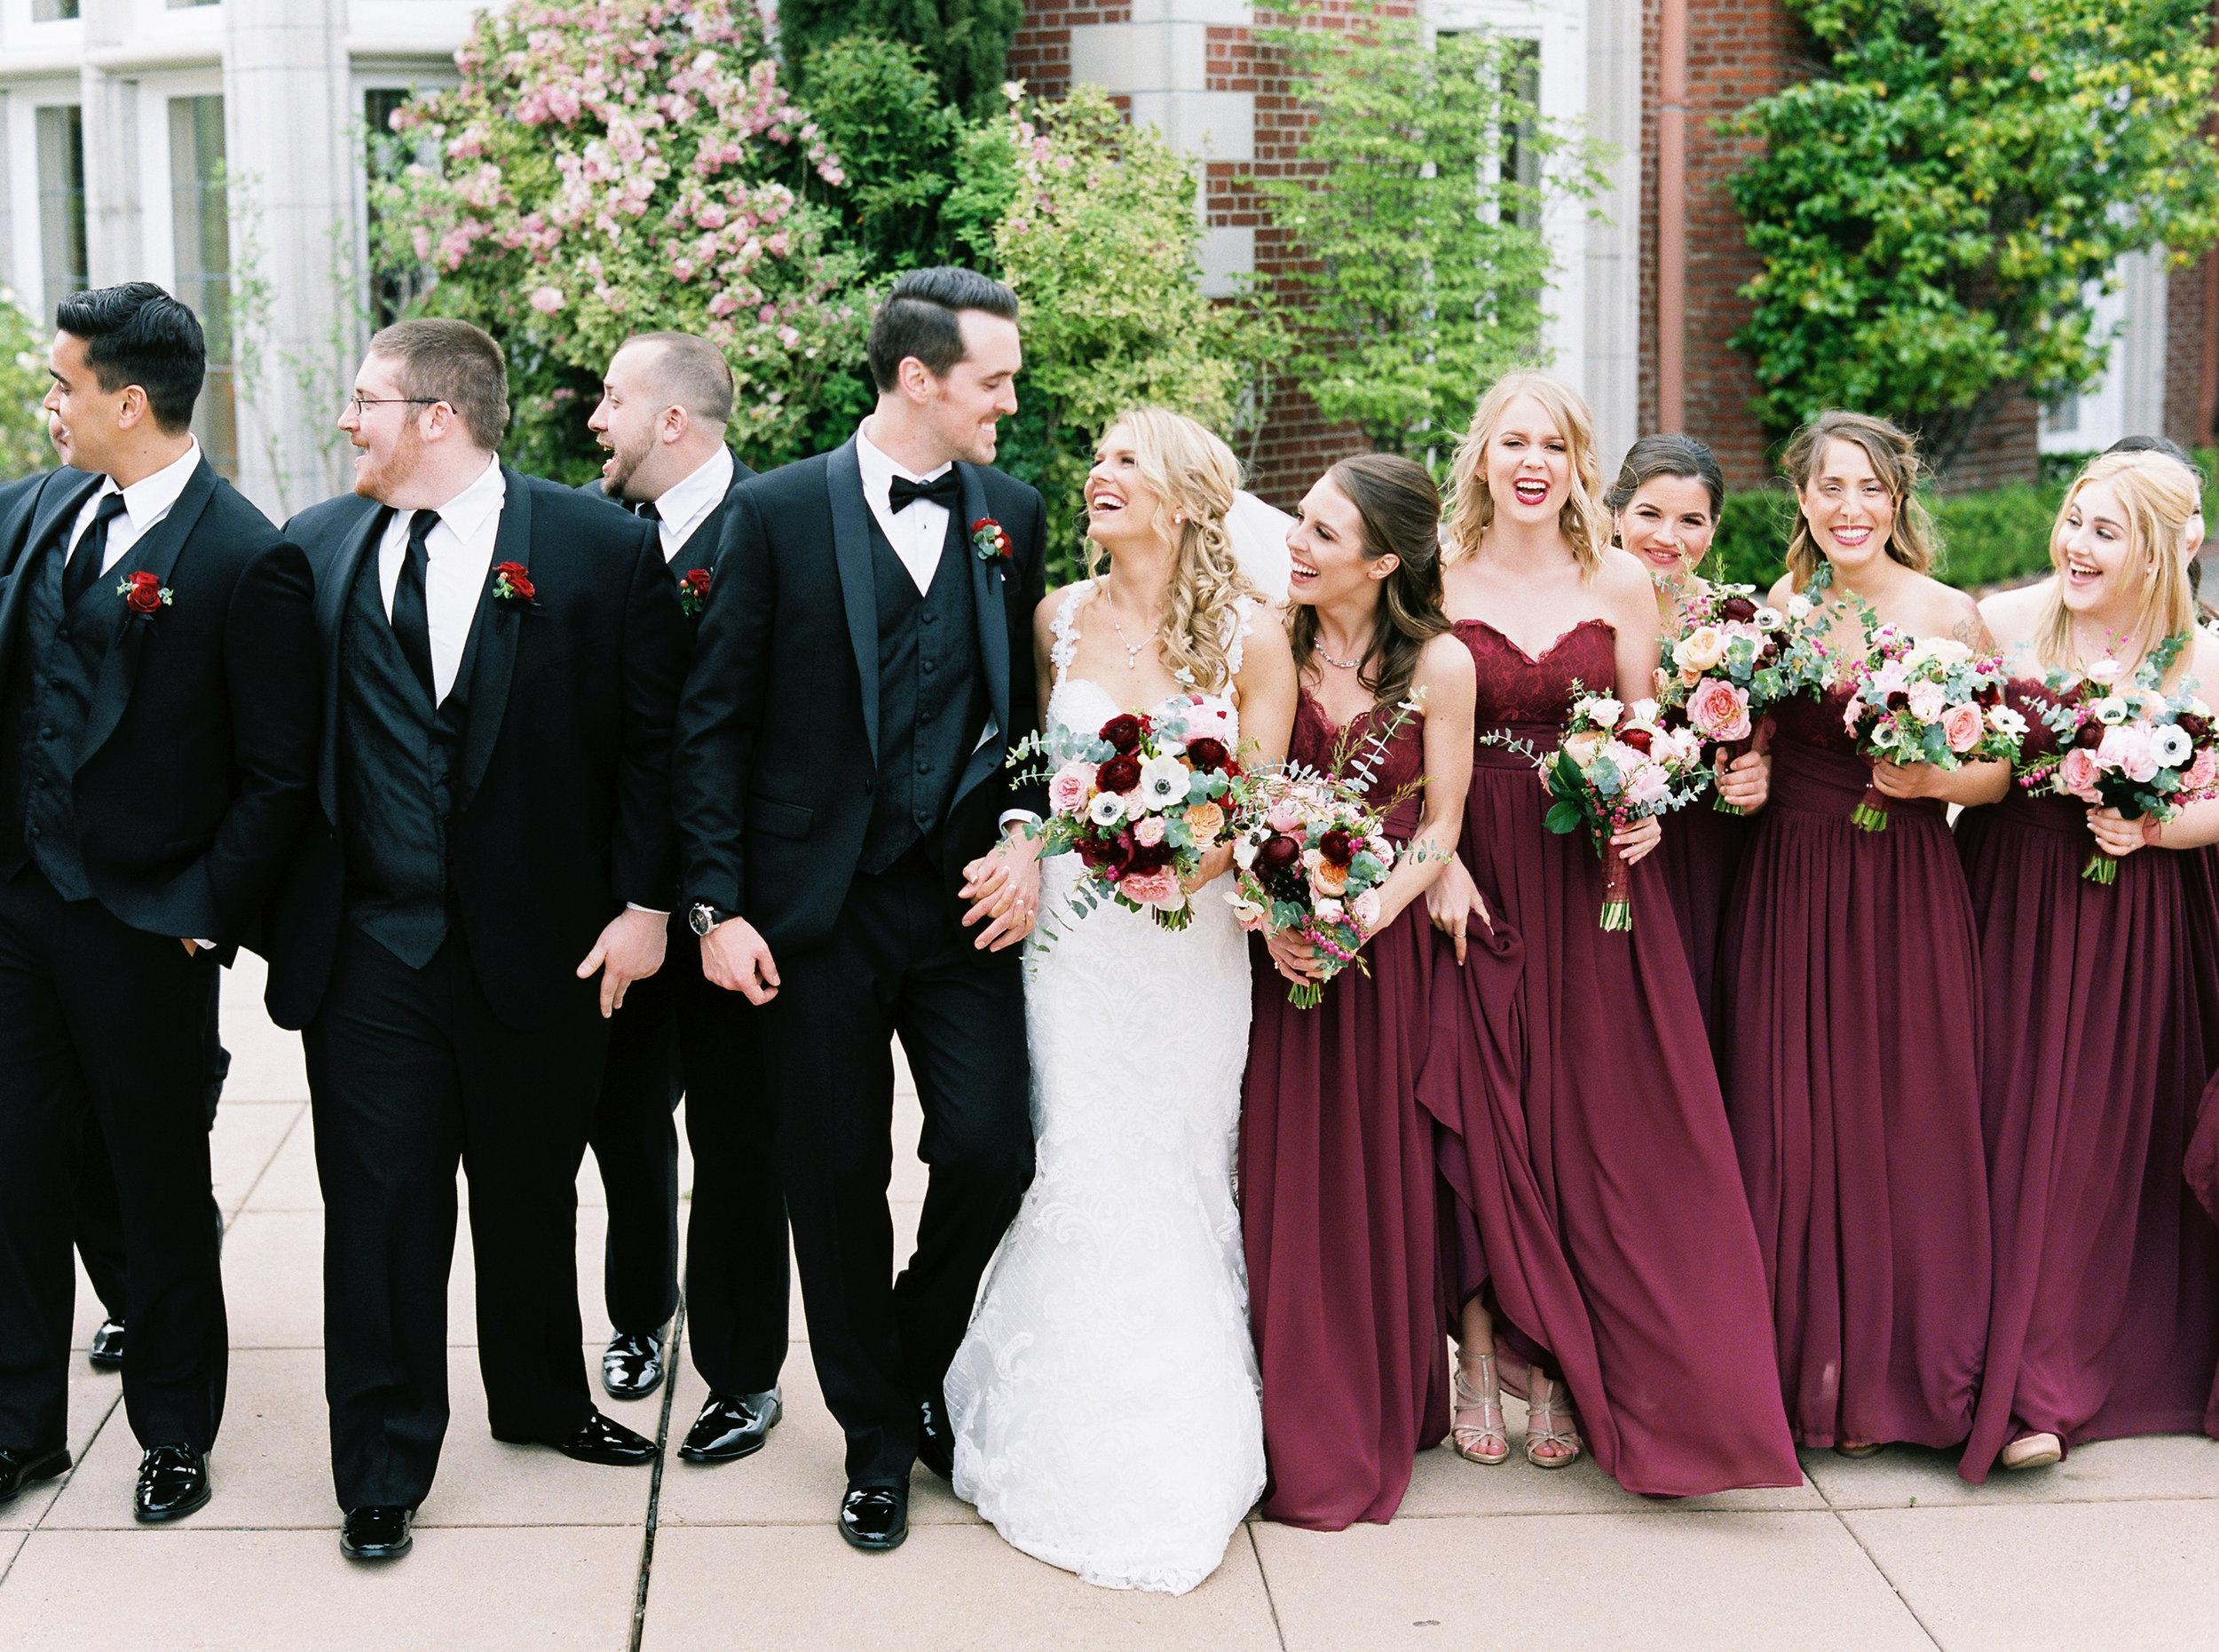 kohl-manison-wedding-photographer-16.jpg